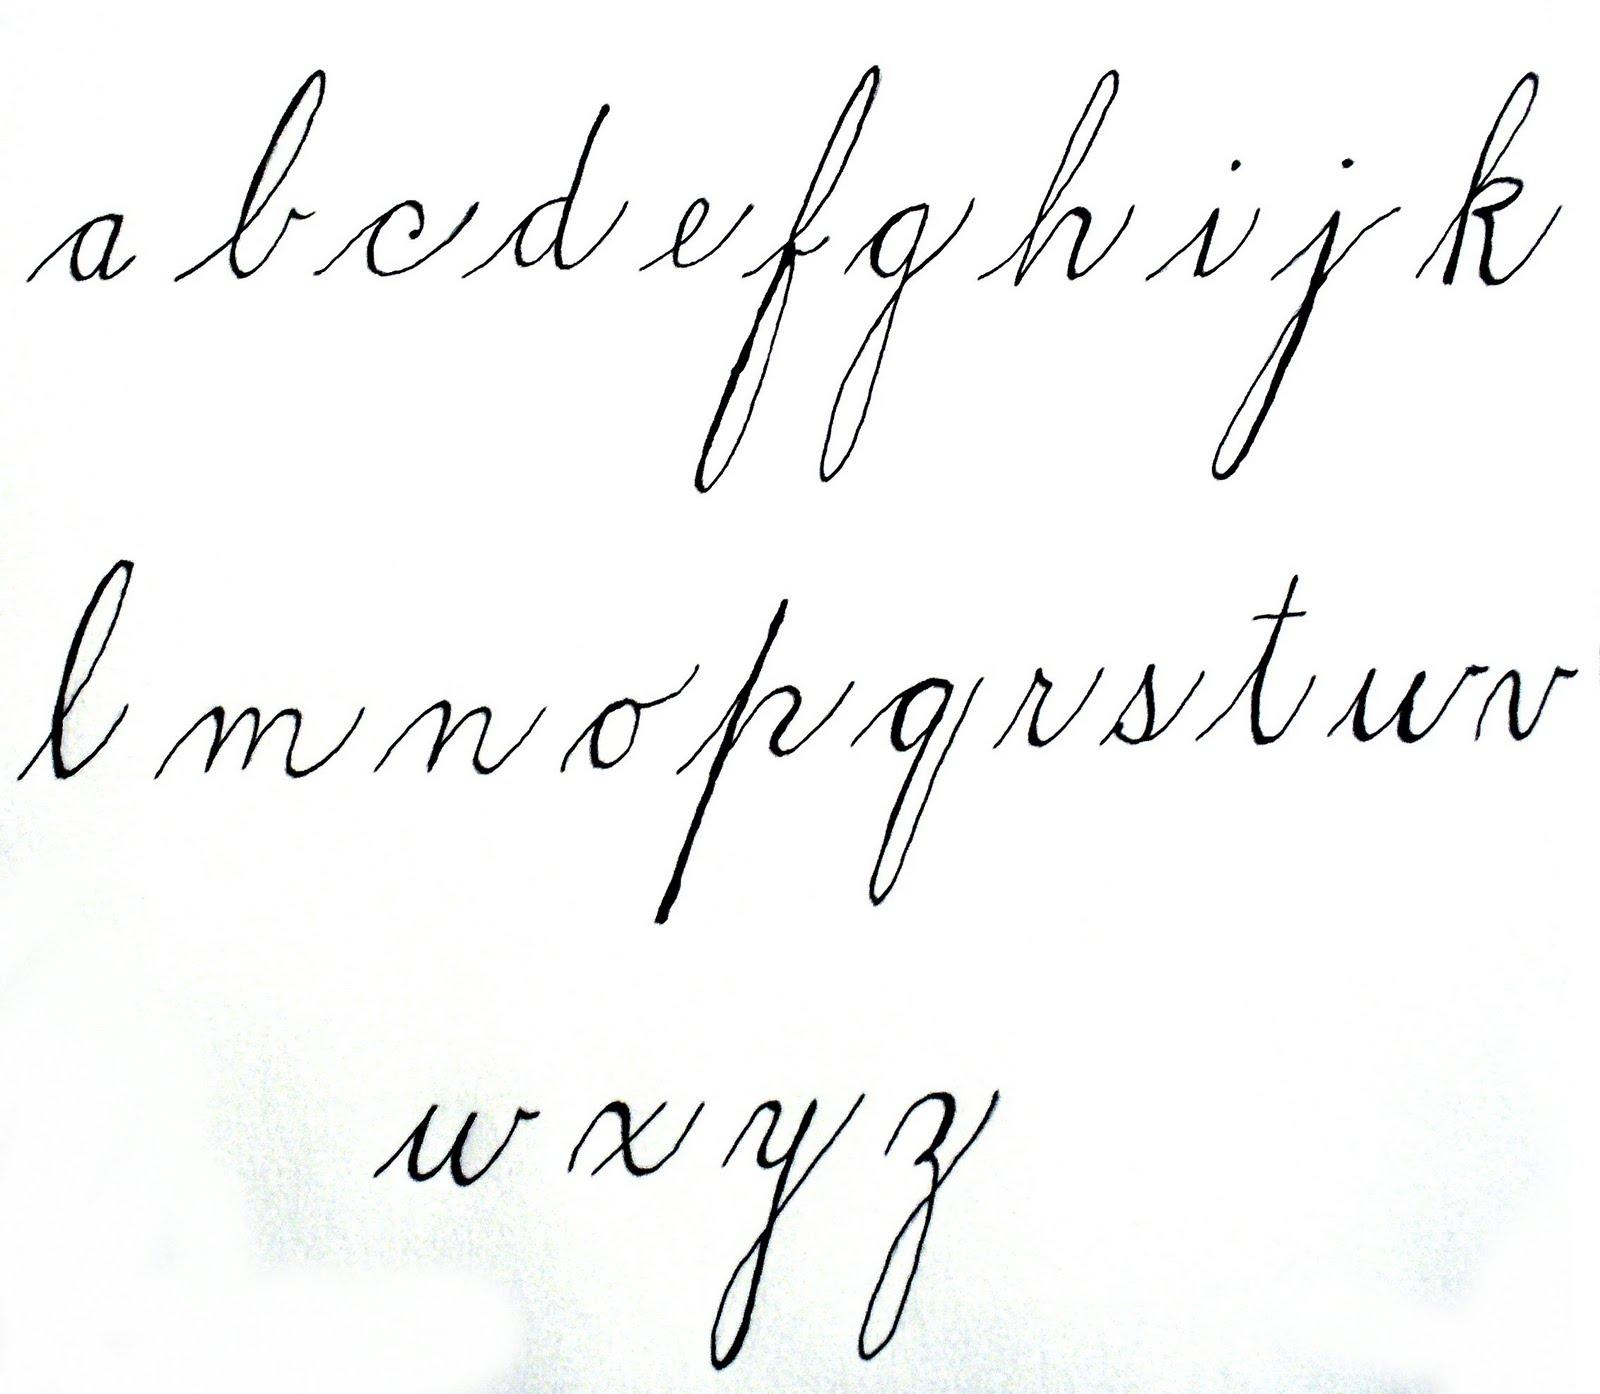 World Turn D Upside Down Spencerian La S Hand Mid S Handwriting Part Ii